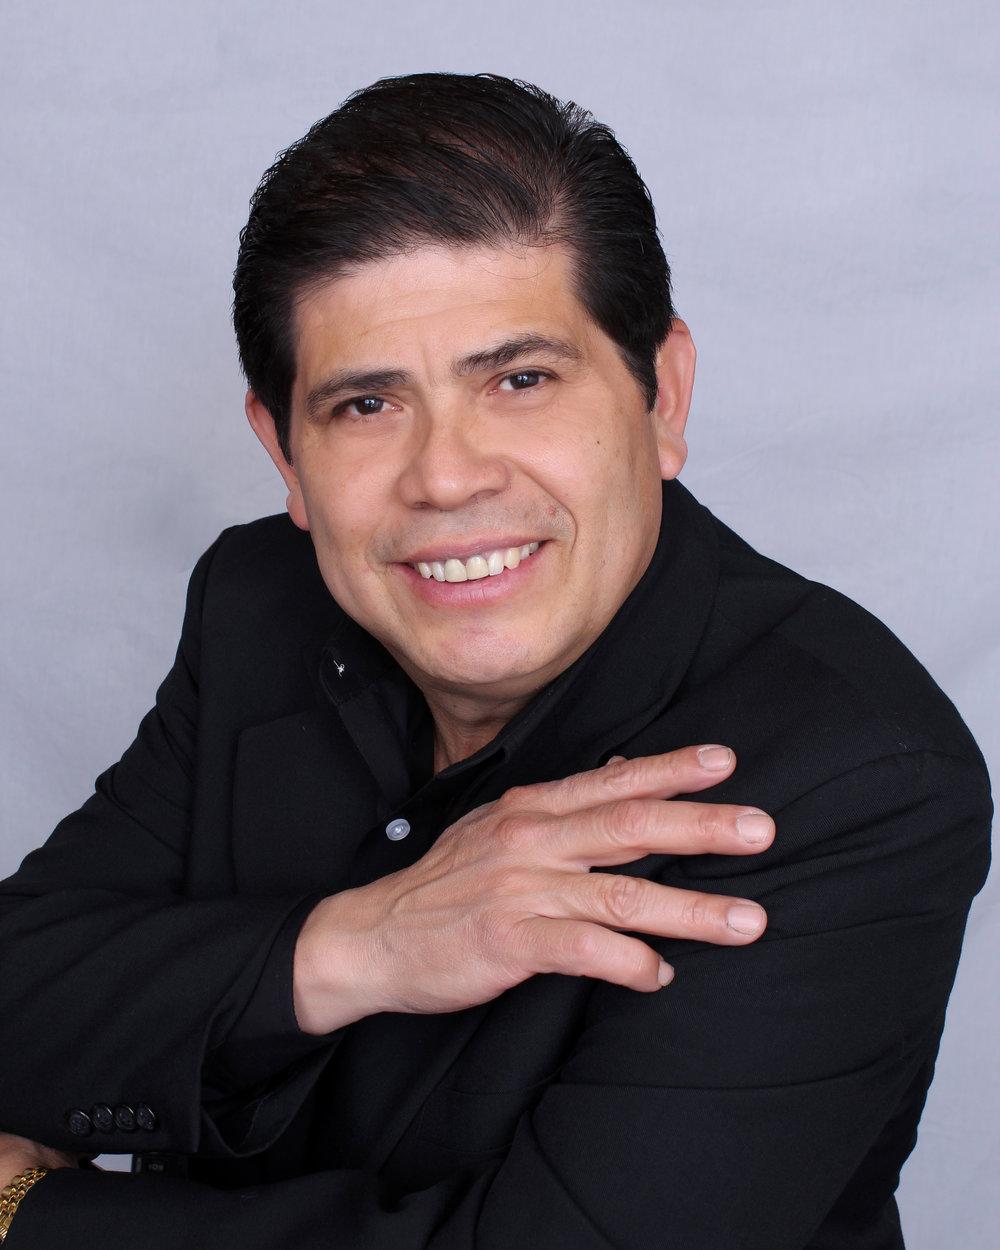 Álvaro Mora - Master Coach e Instructor